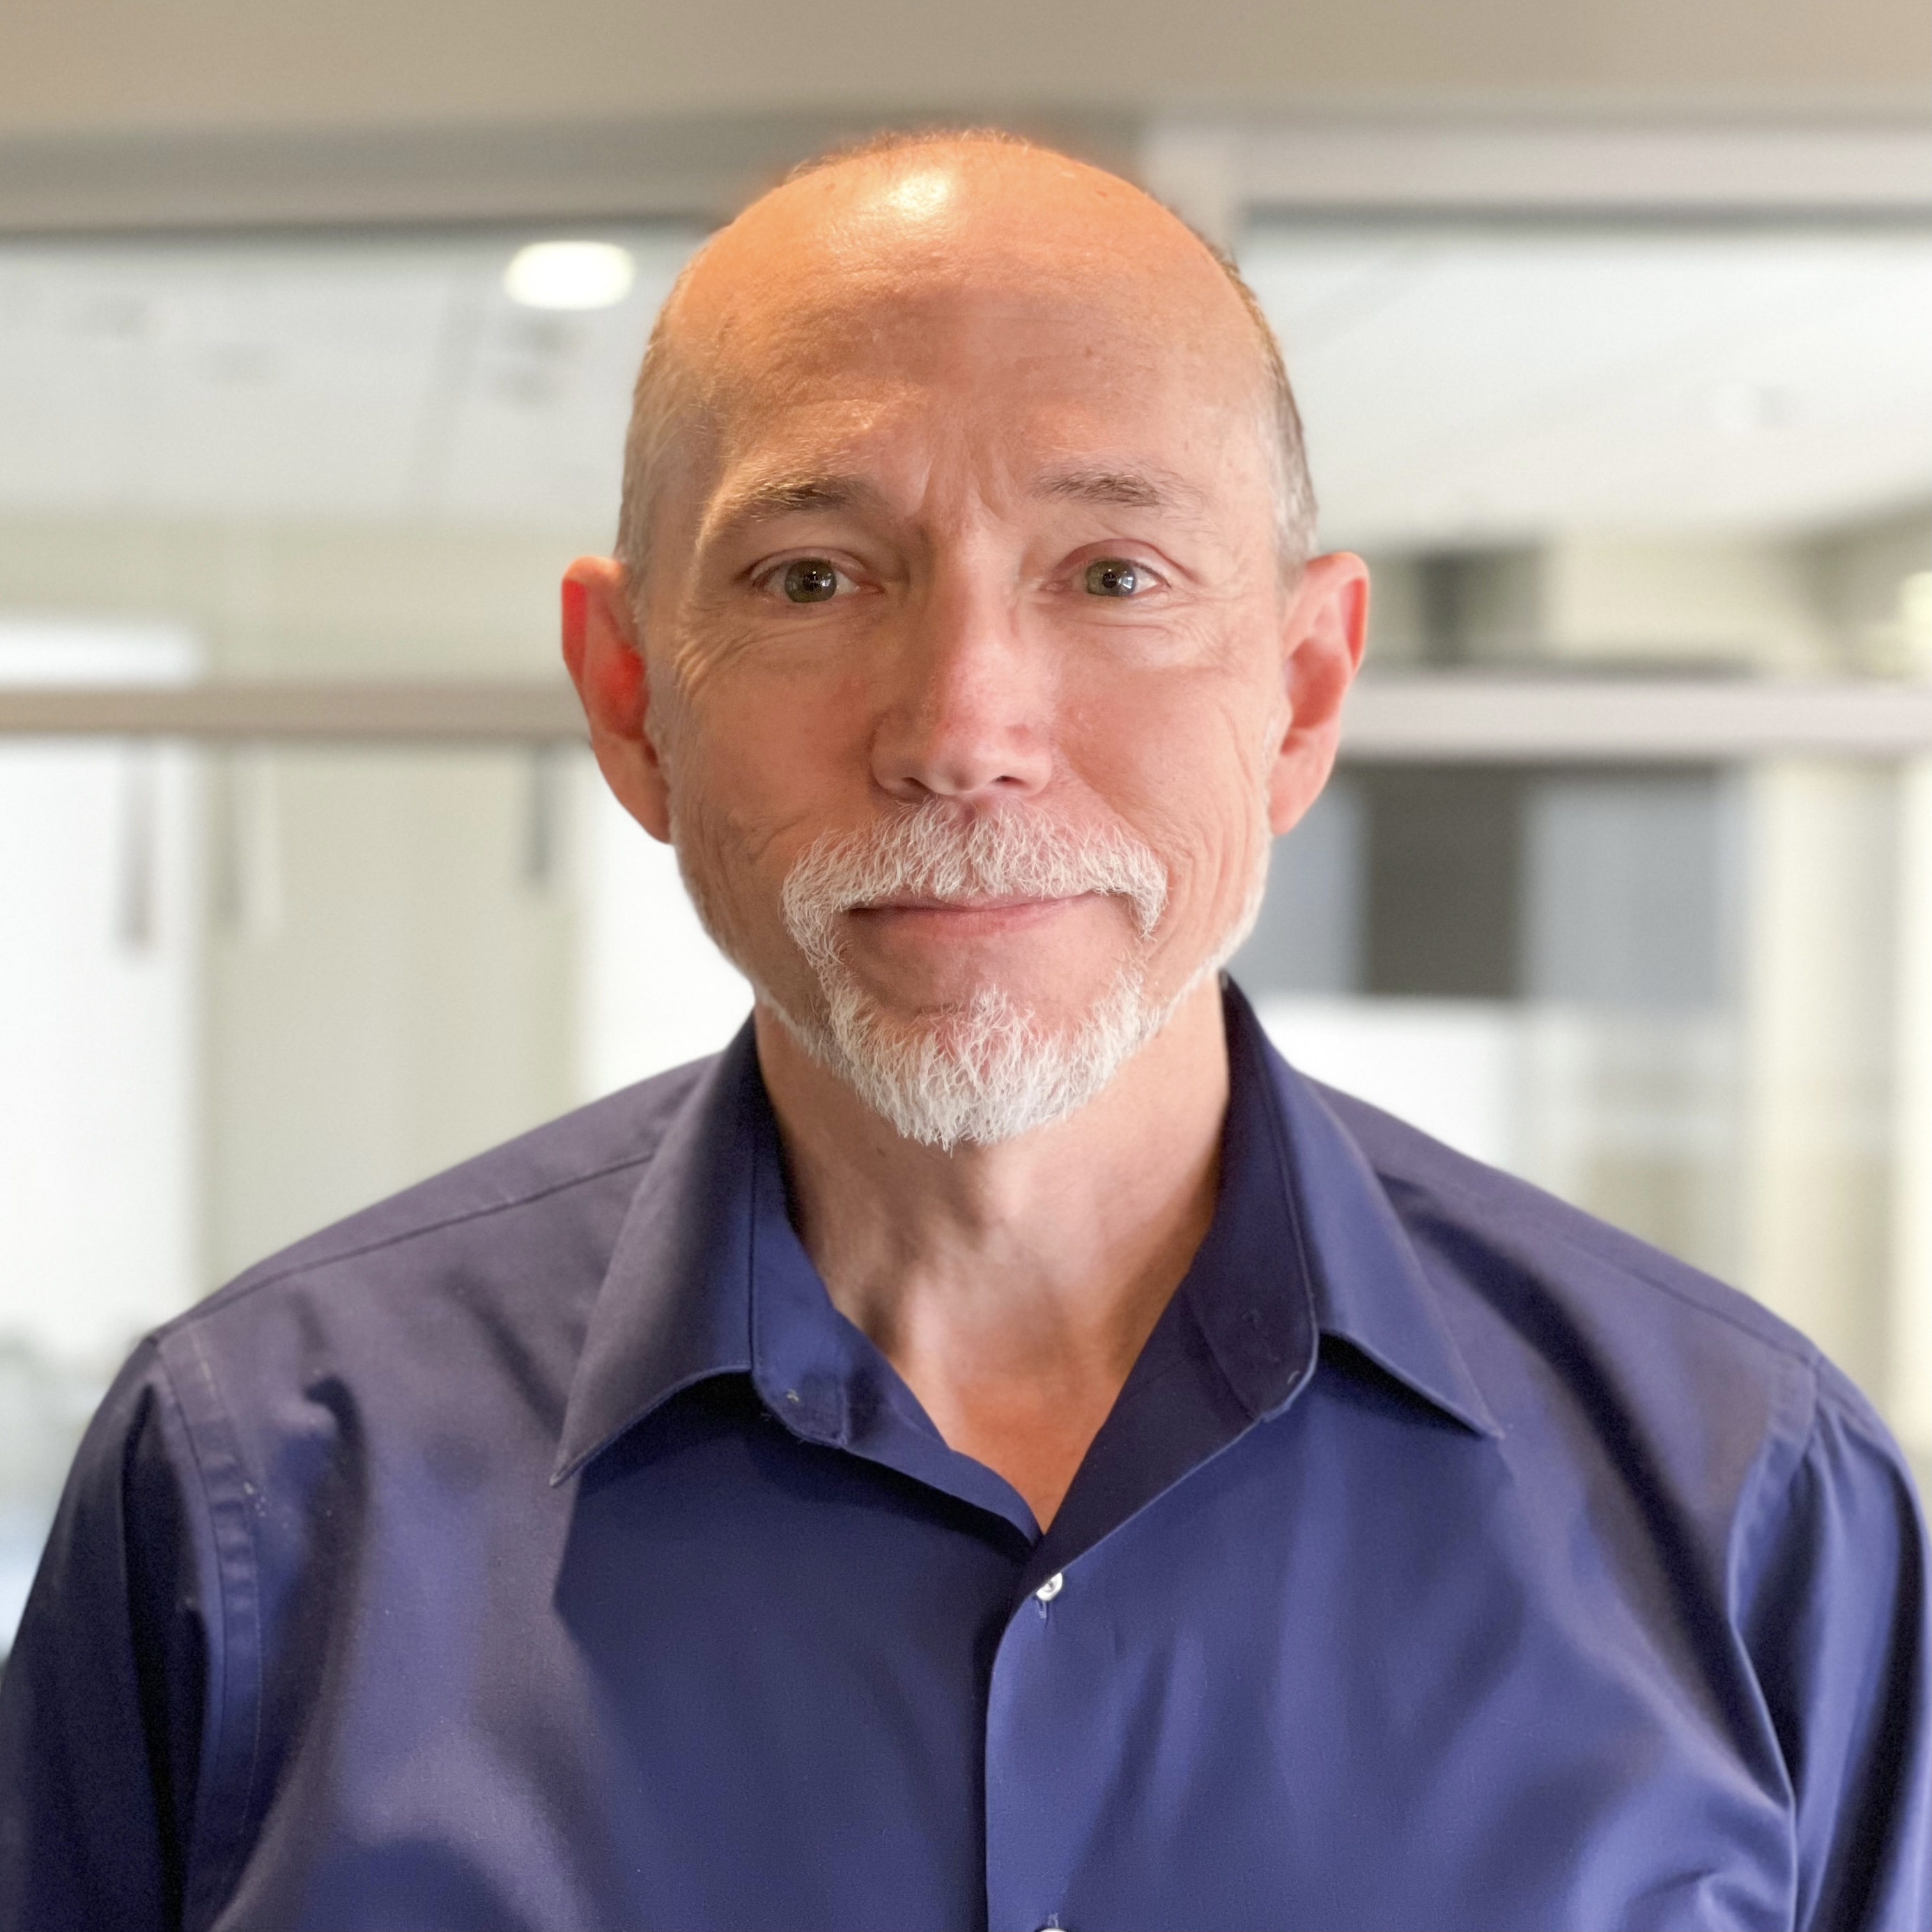 Michael Tibbs, IT Manager